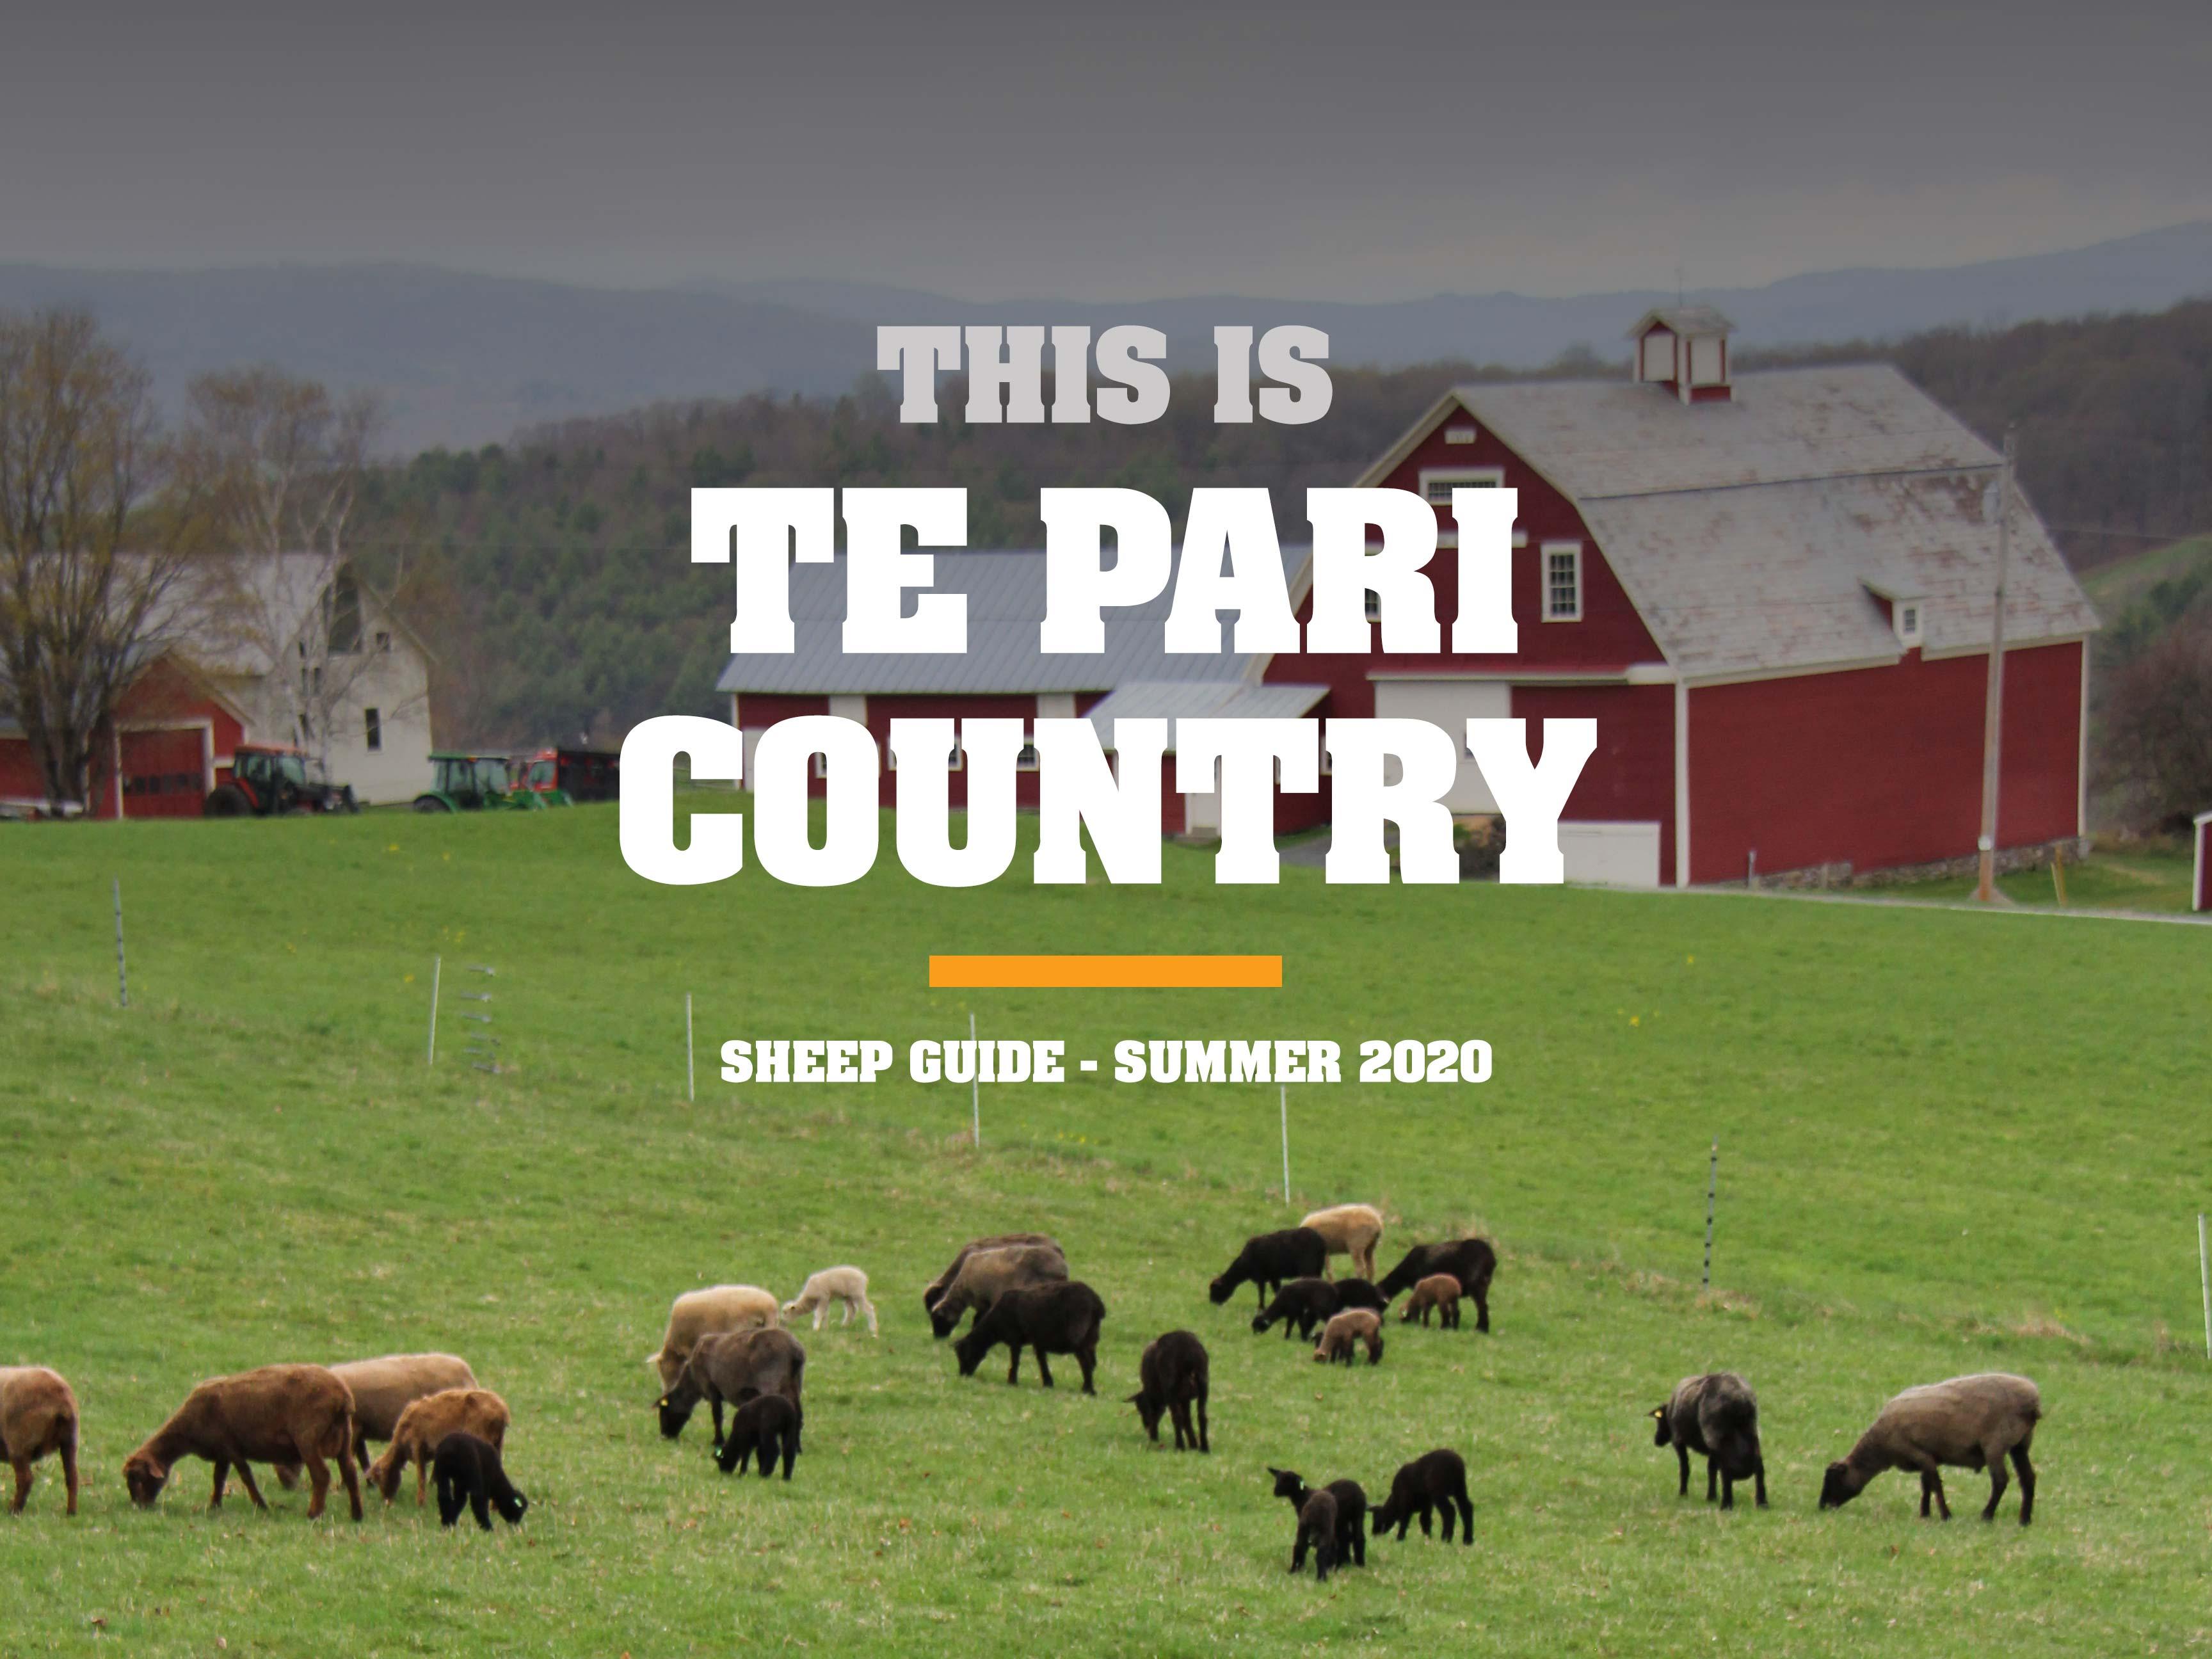 USA Sheep Guide Summer 2020